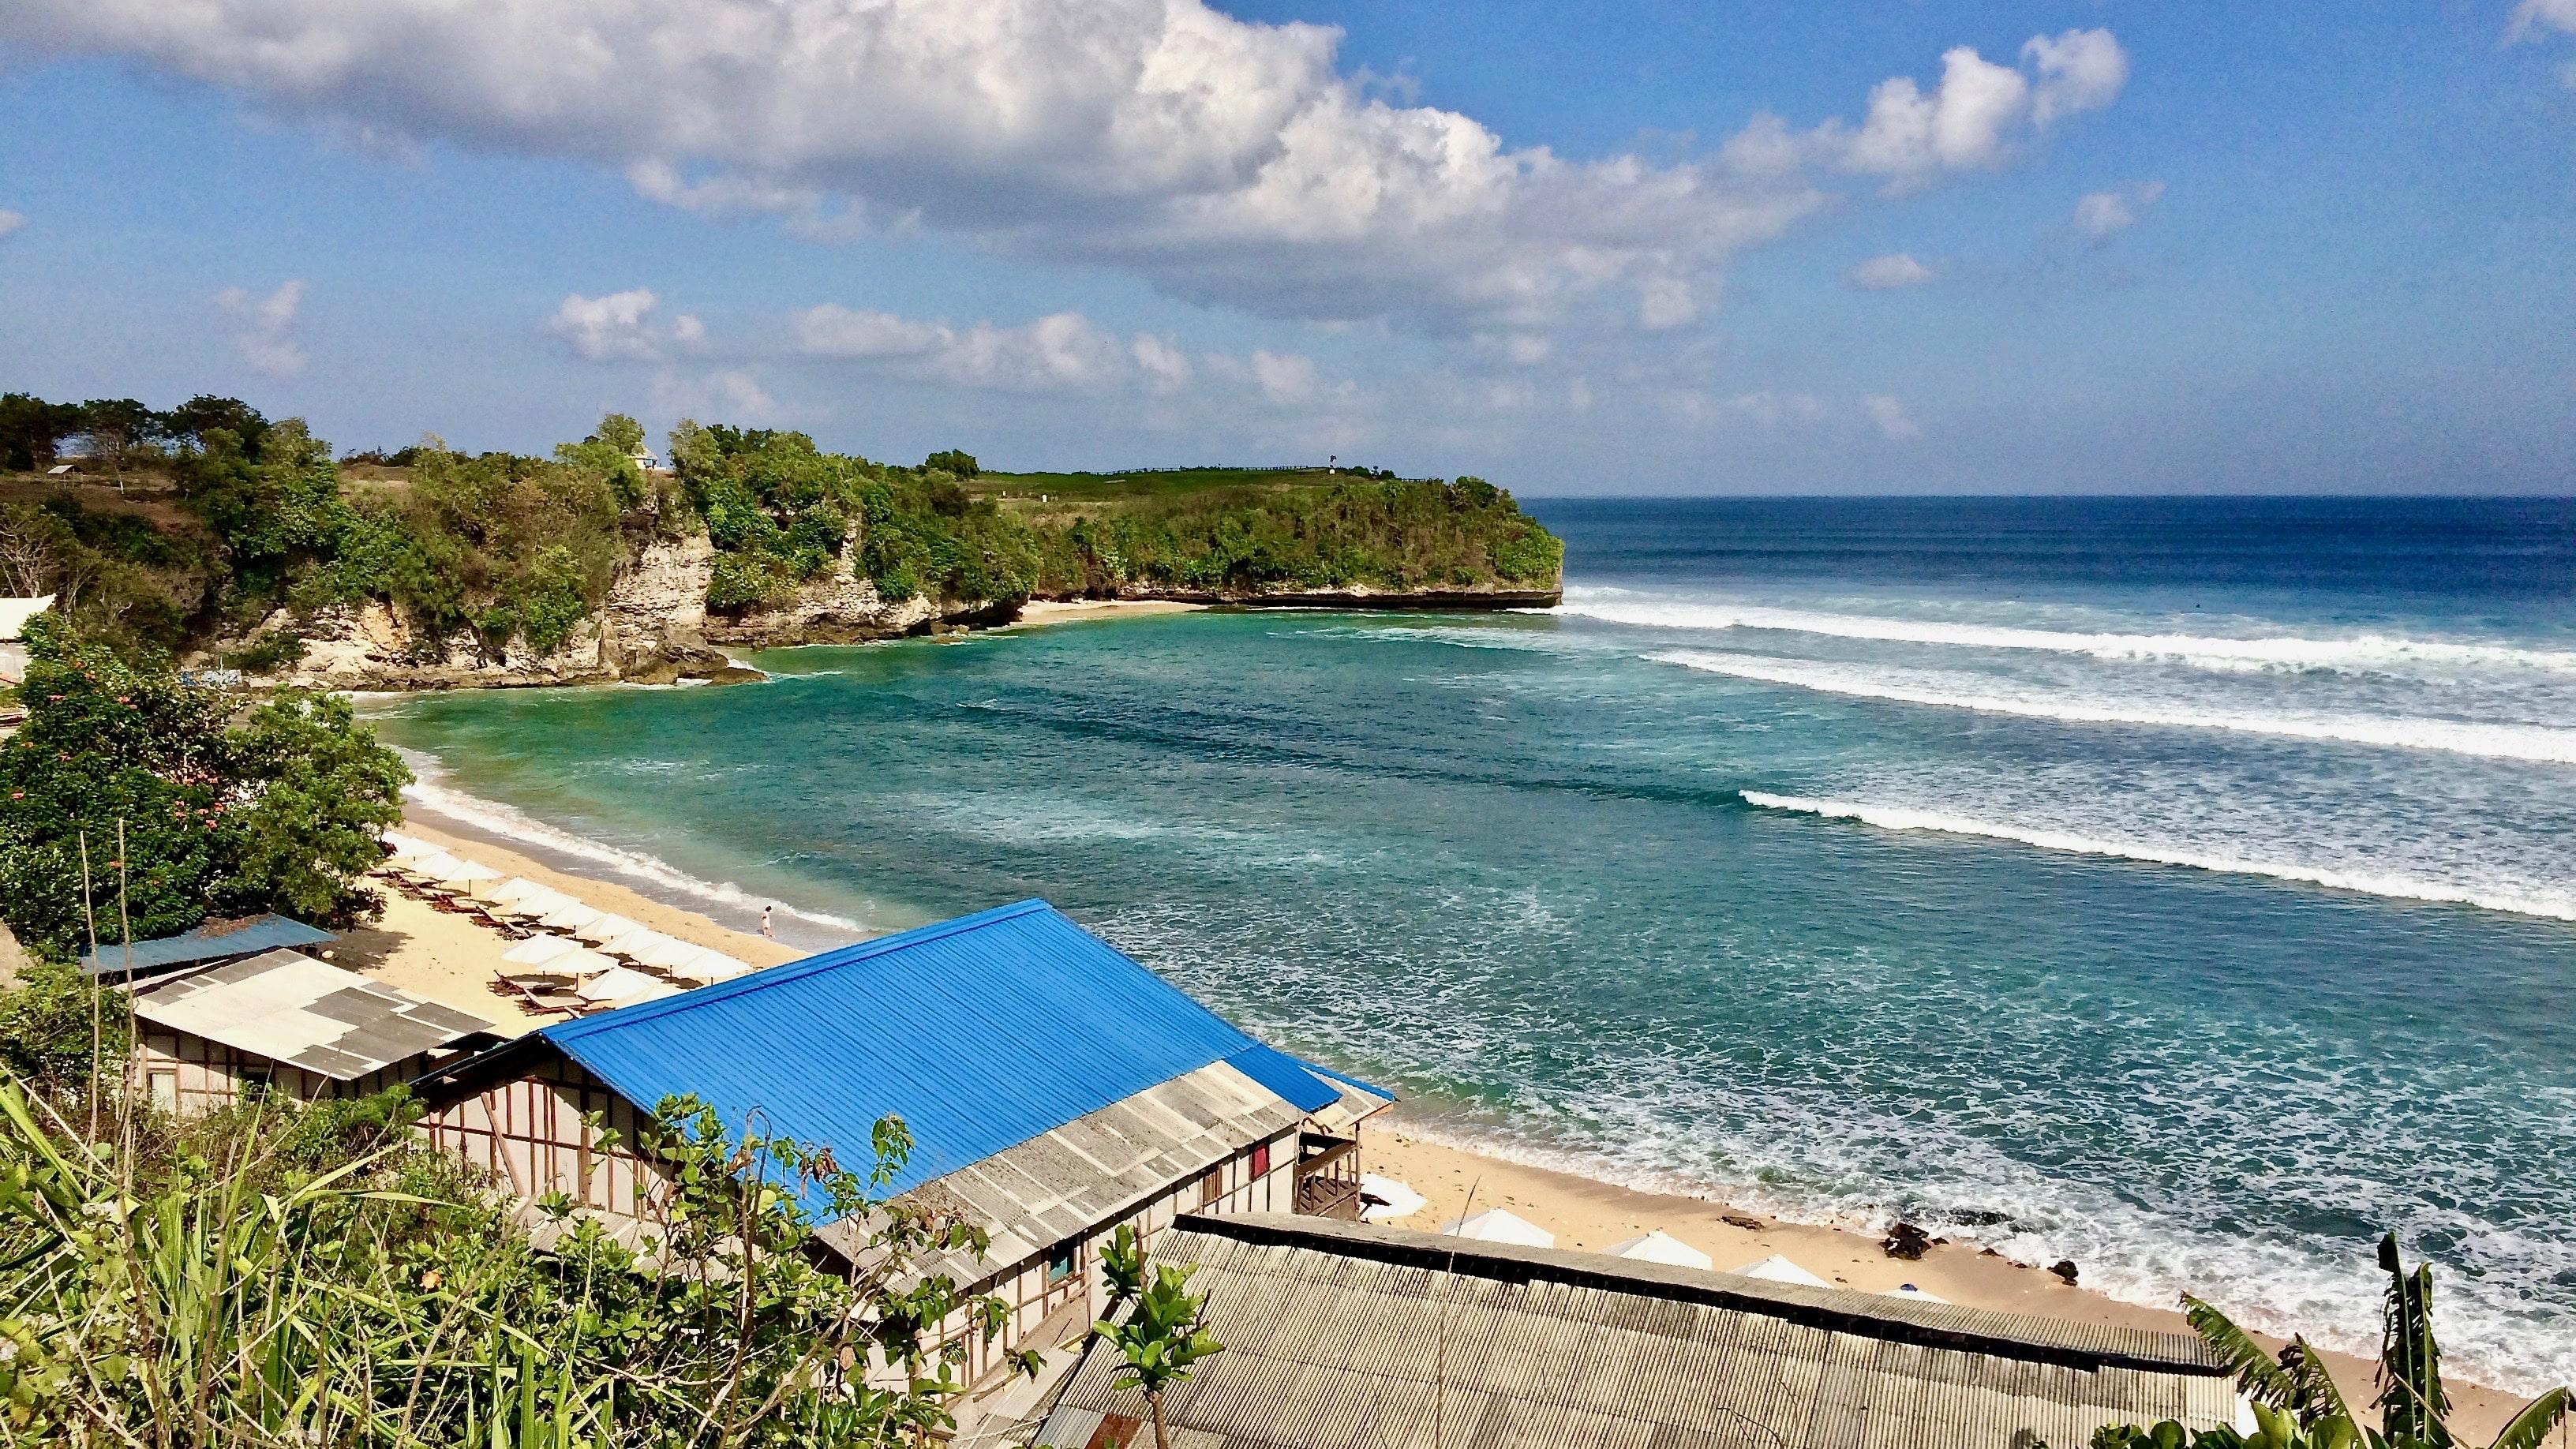 la playa de Balangan.